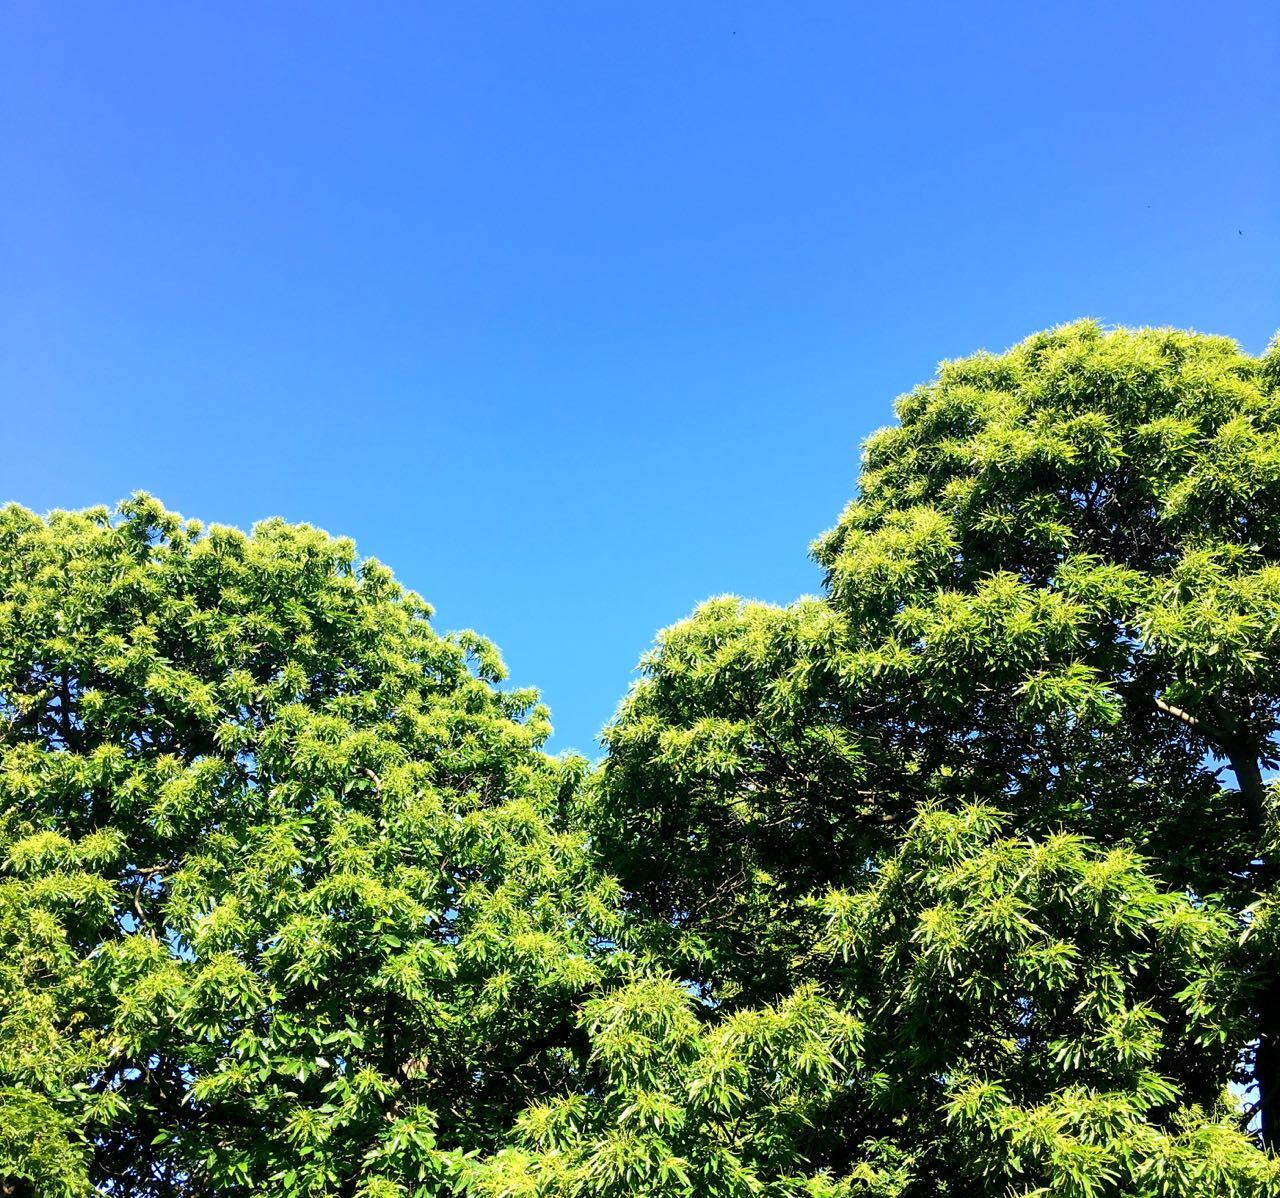 Blue skies - how amazing?